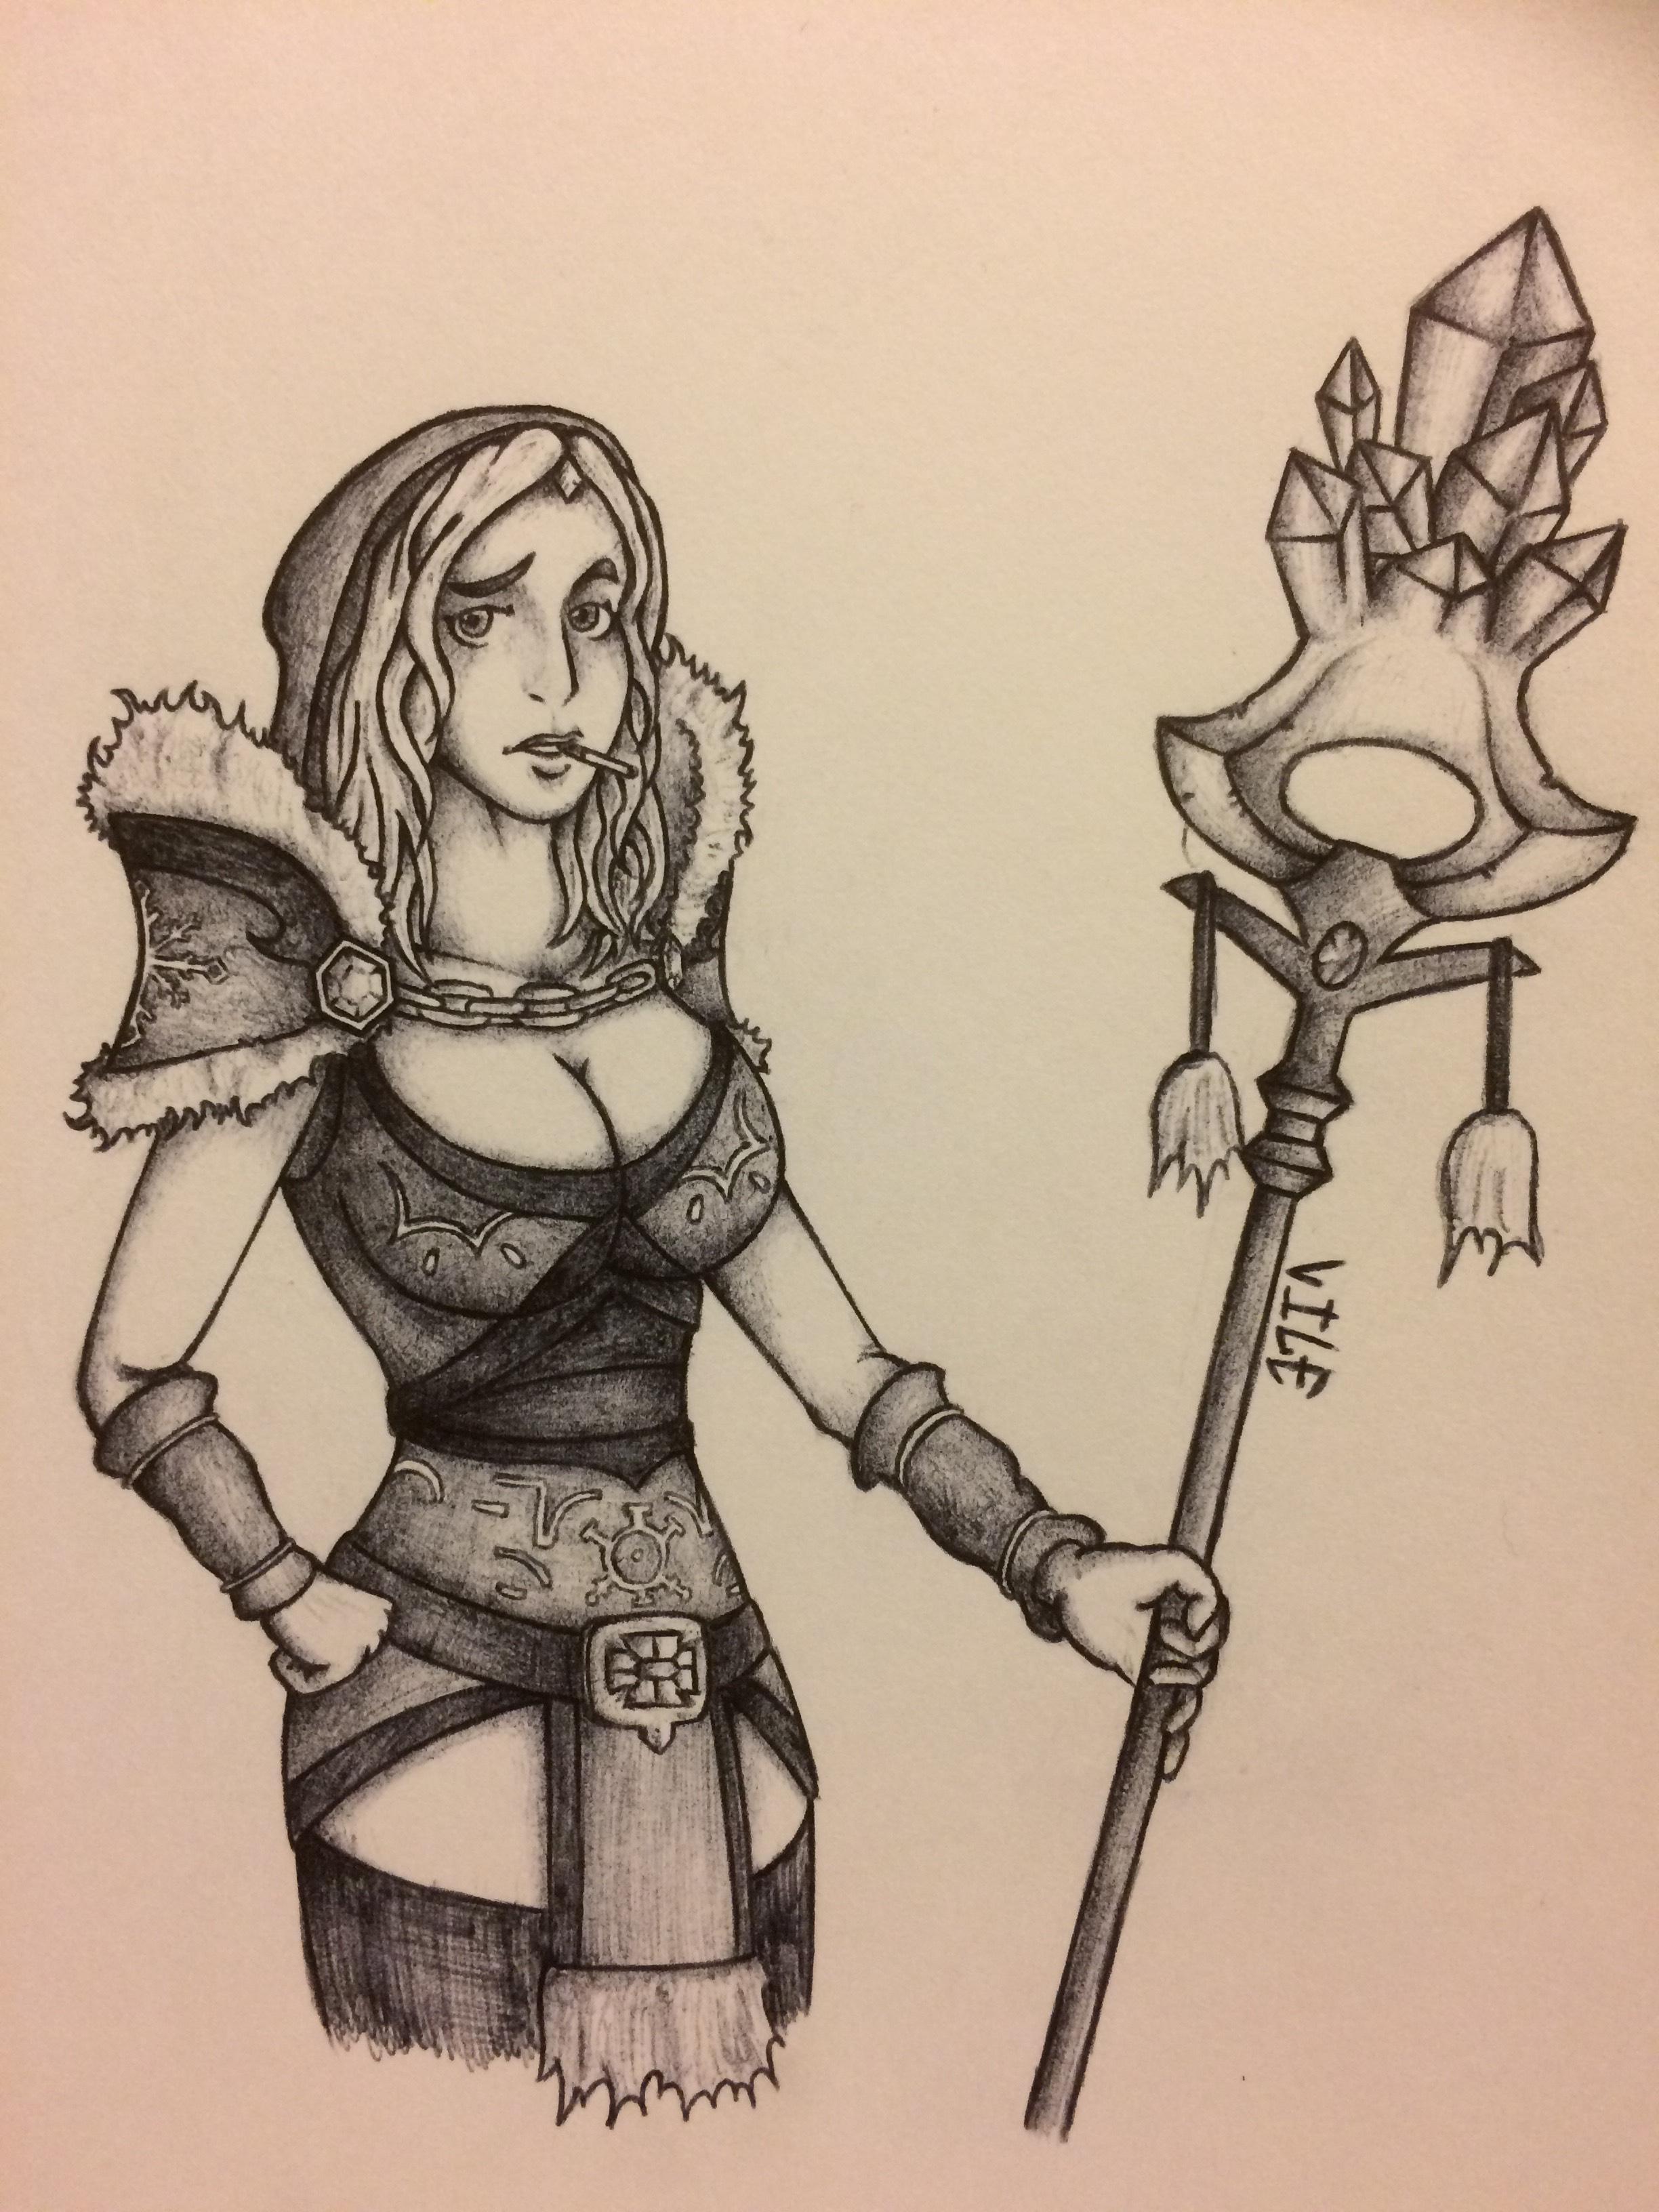 Crystal Maiden Pen Doodle Insert Title Here lololololol